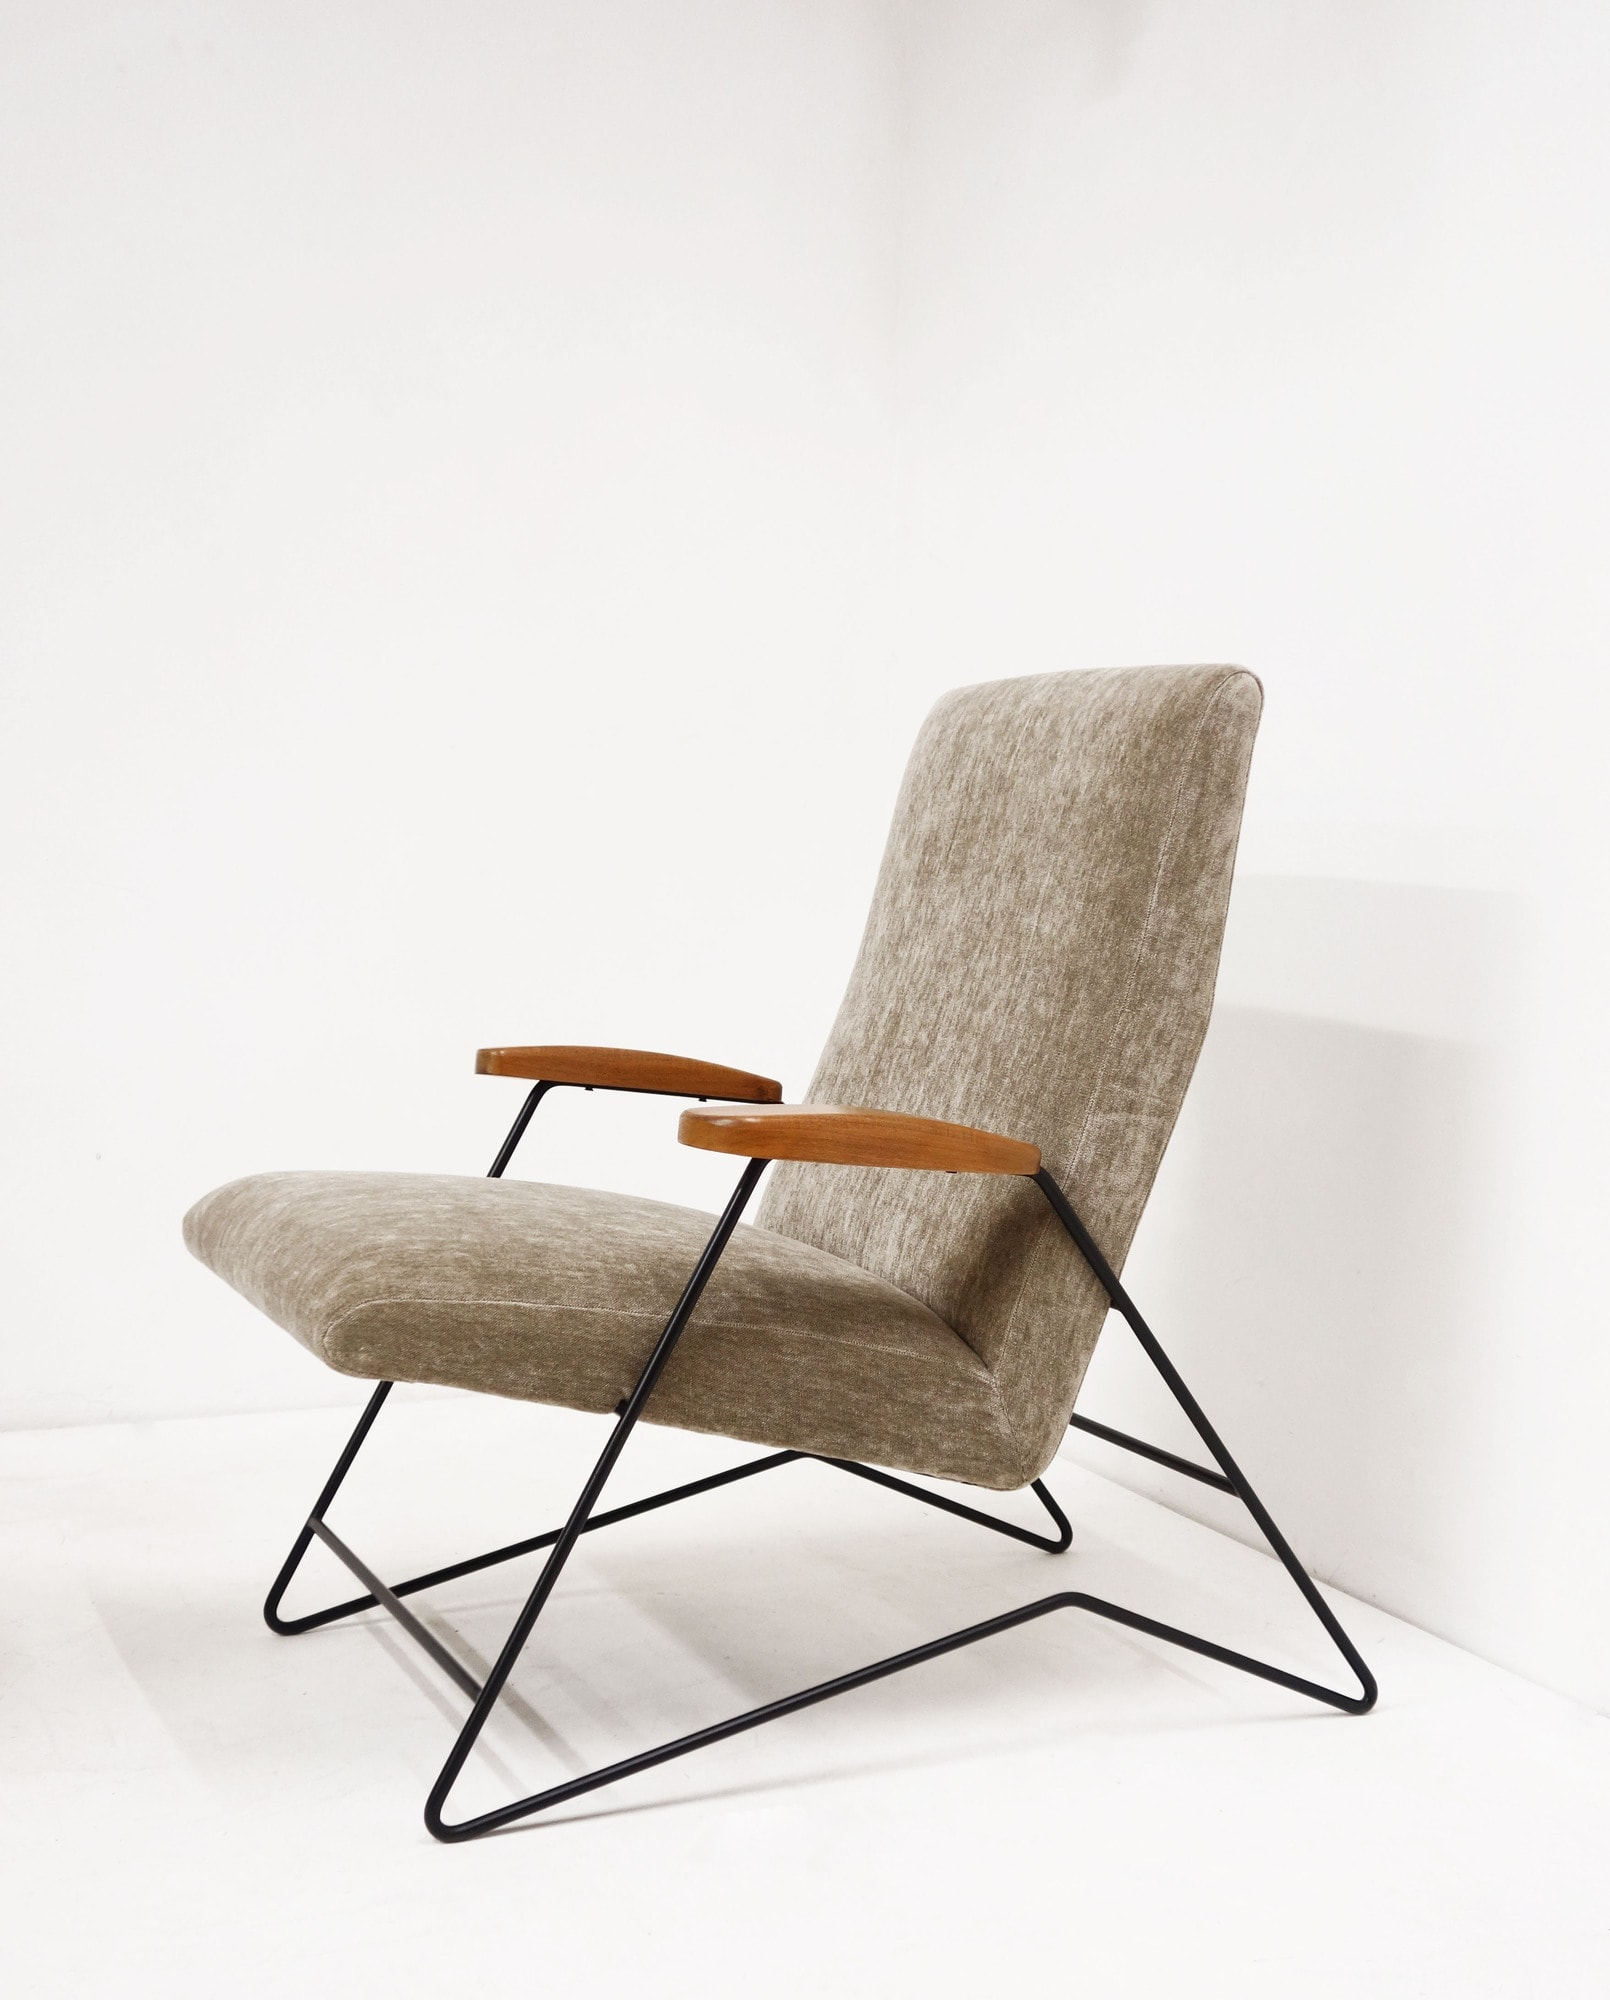 Carlo Hauner & Martin Eisler, Pair of armchairs, vue 03